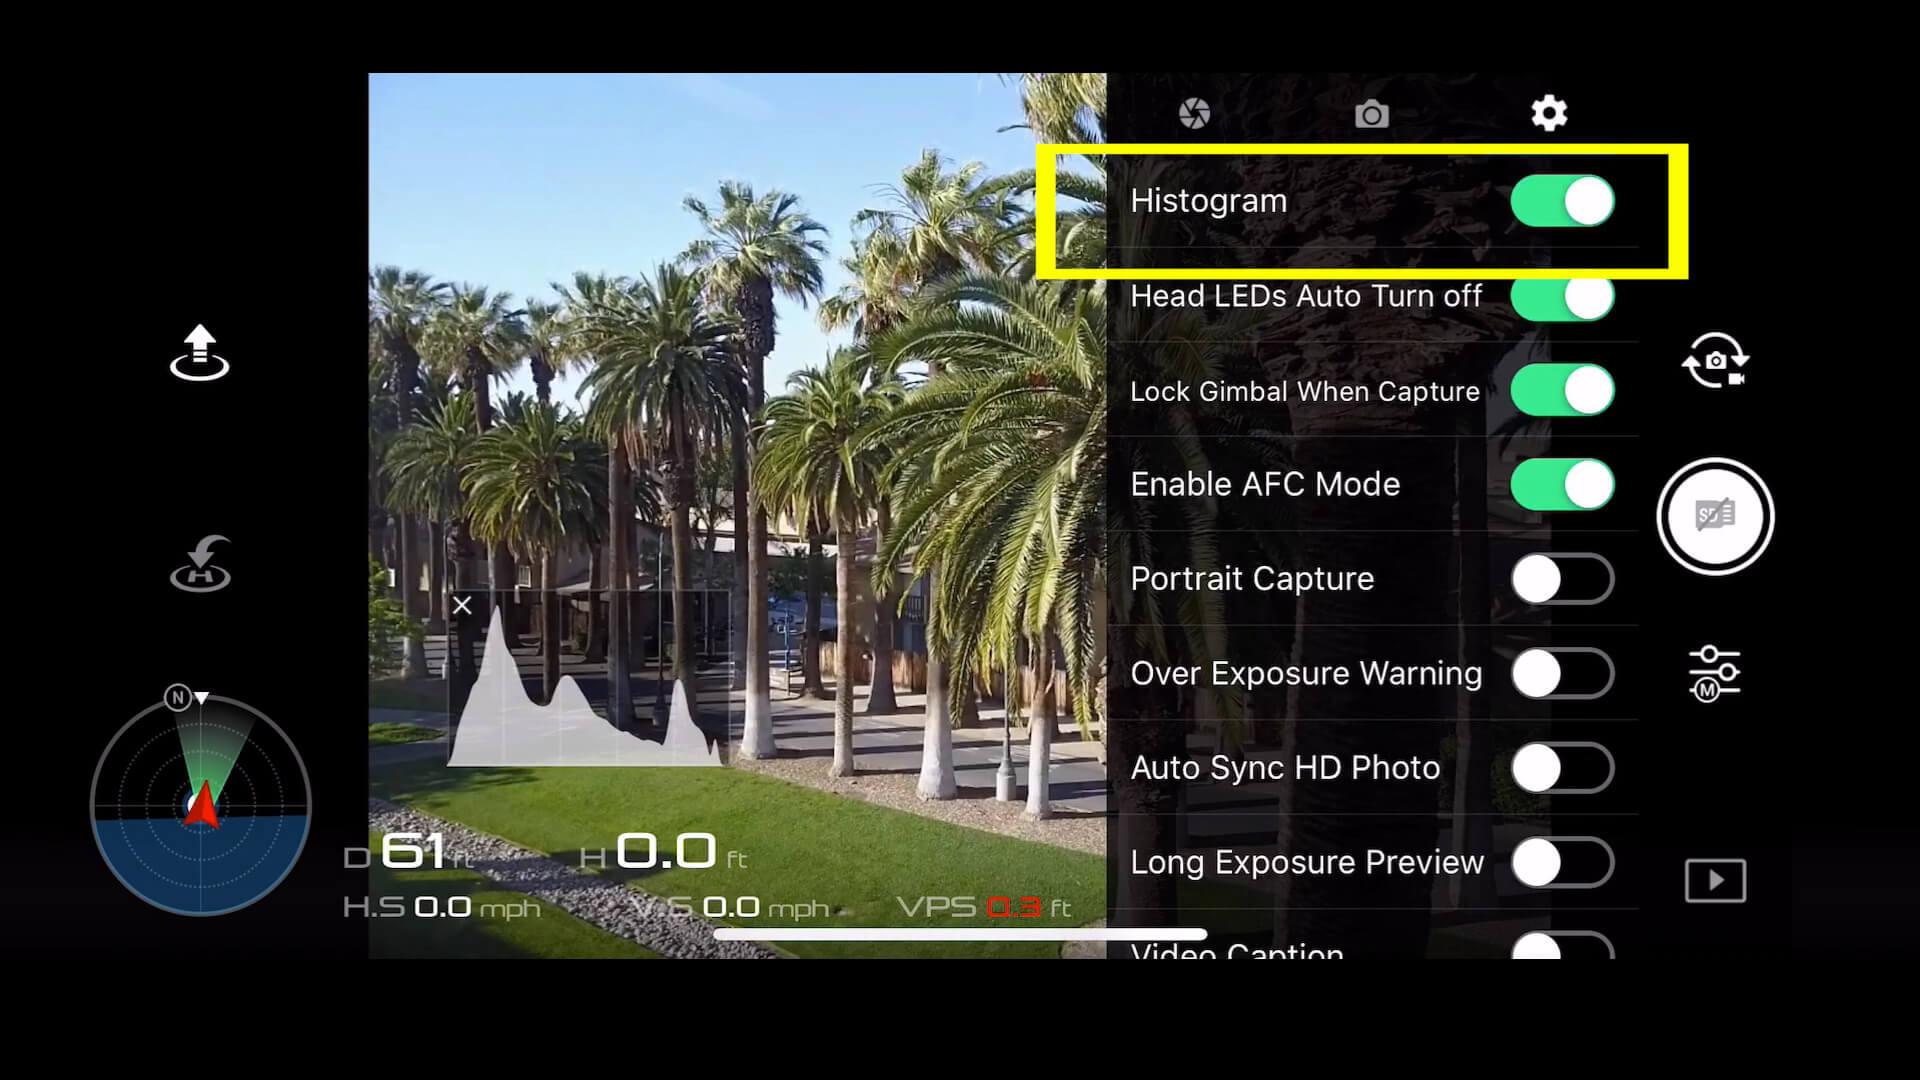 5 basic camera settings for dji drone photos - 4 histogram - b